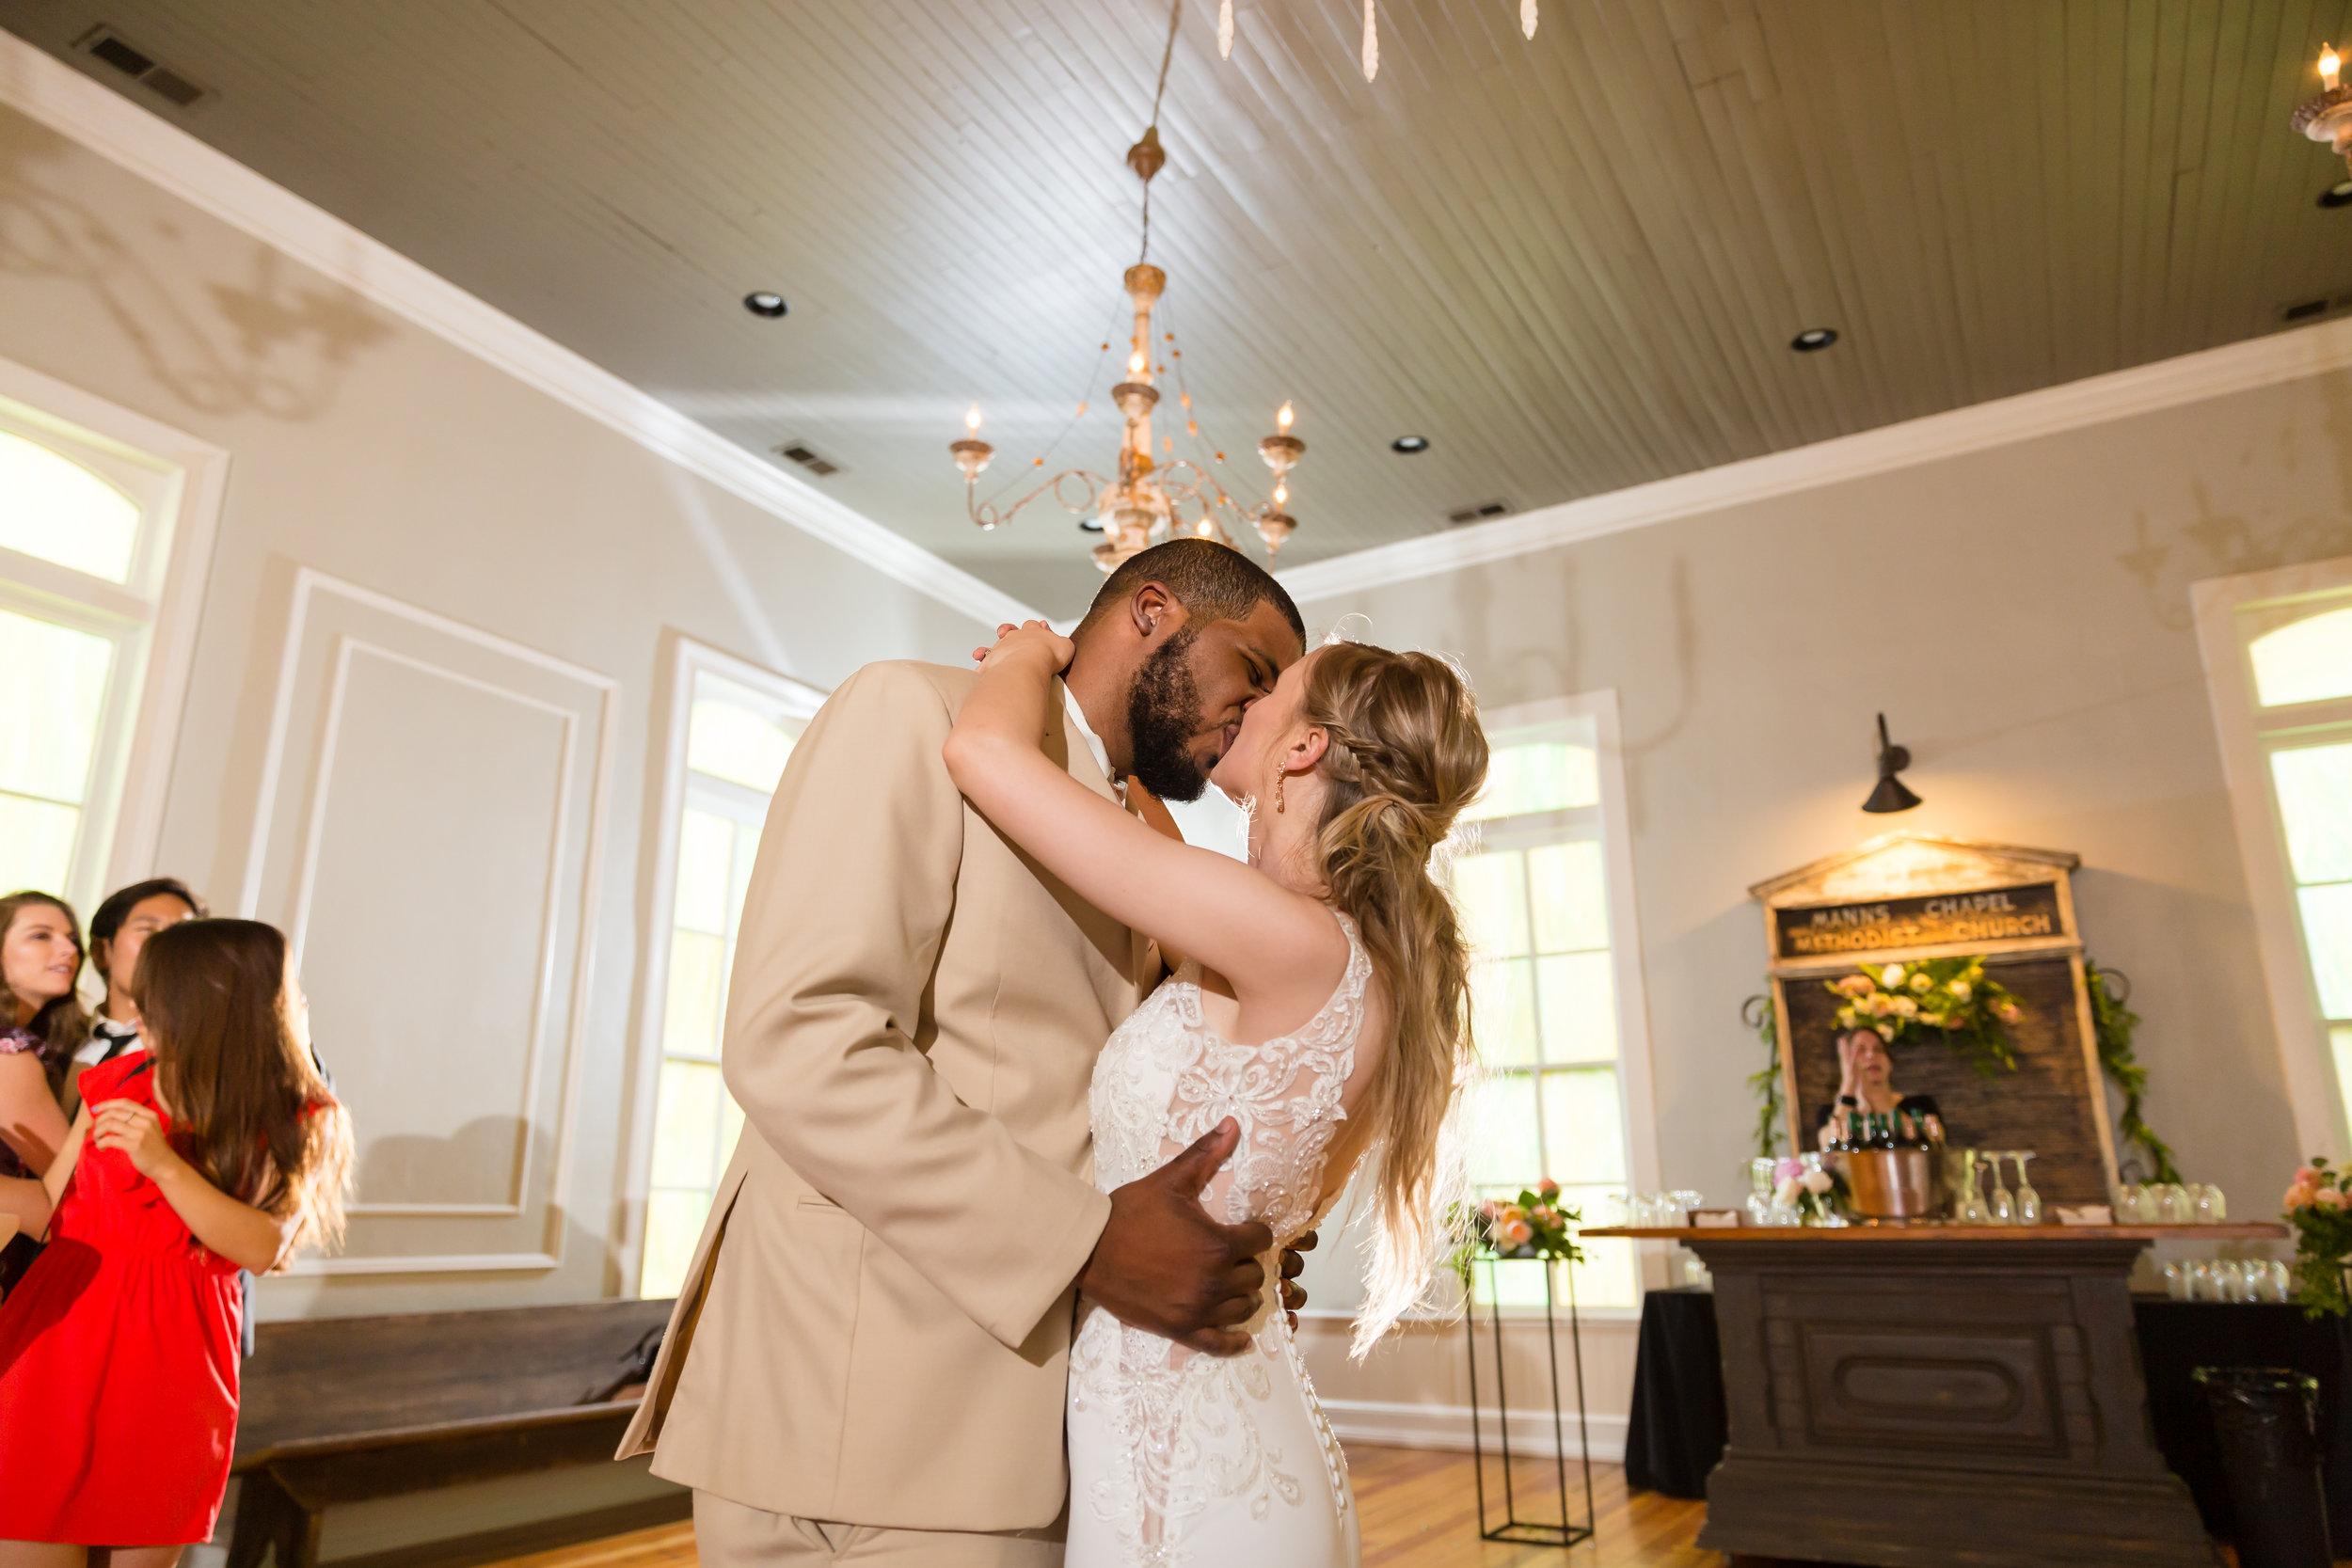 sarah_ikeem_wedding_at_the_parlour_at_manns_chapel_05.18.19-1413-2.jpg